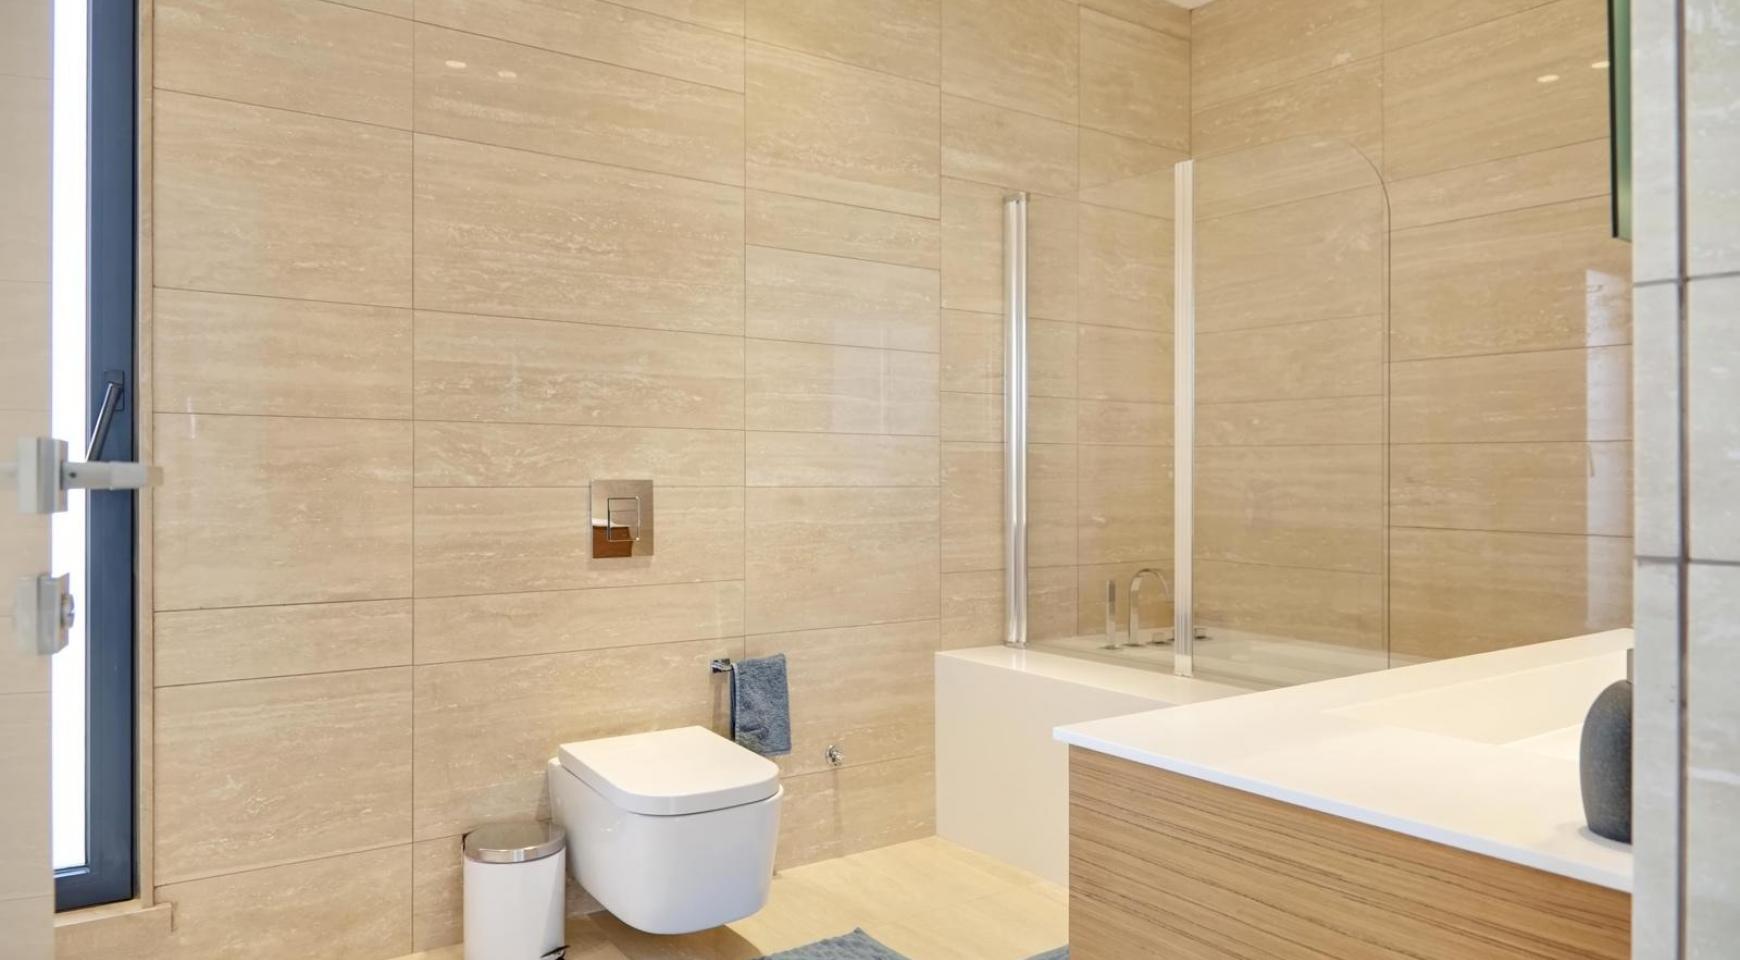 New Luxurious 4 Bedroom Villa in the Tourist Area - 47